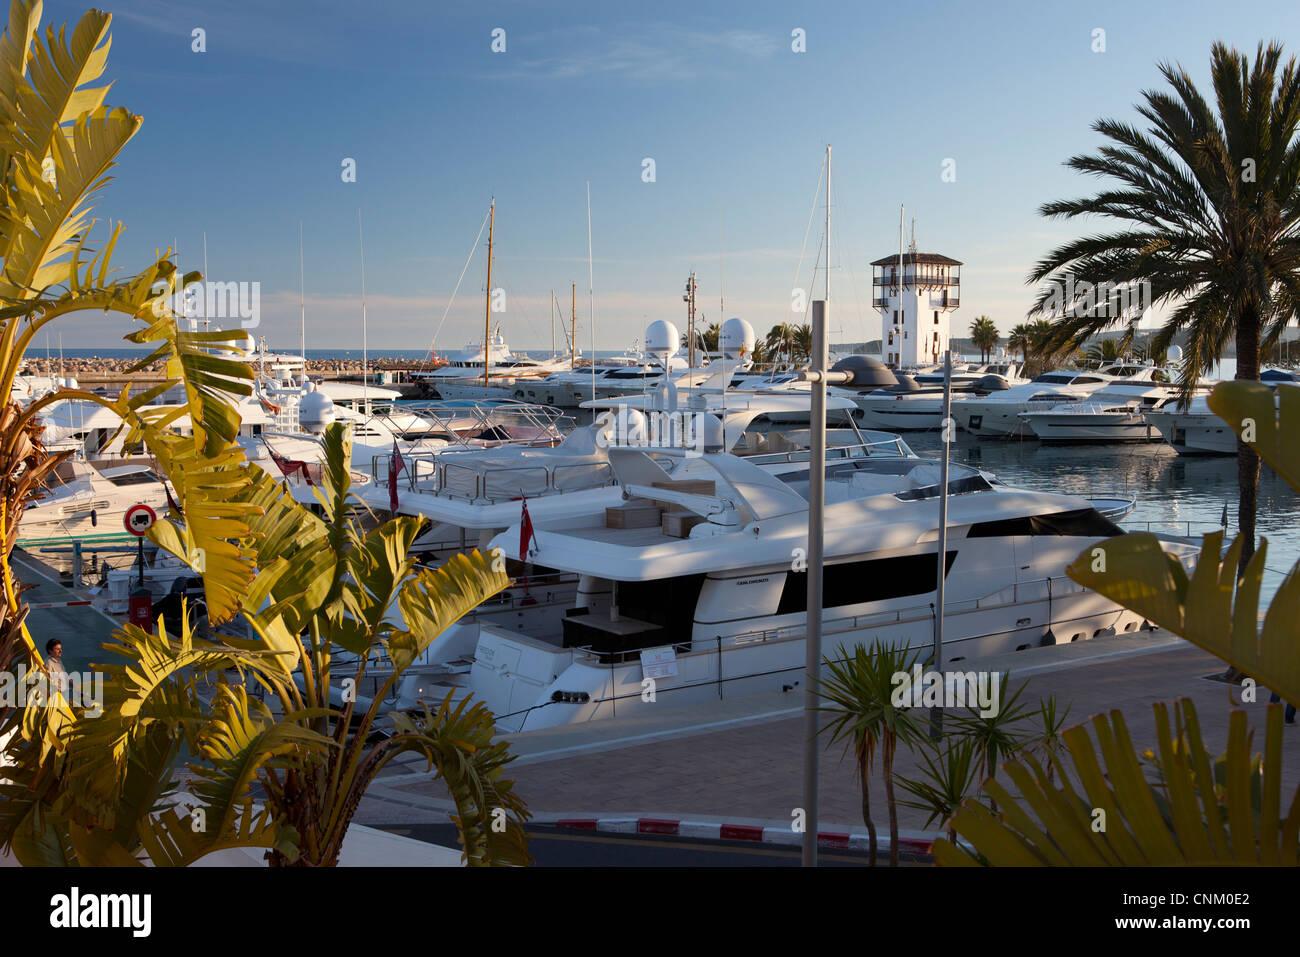 Puerto Portals in Majorca, Spain - Stock Image